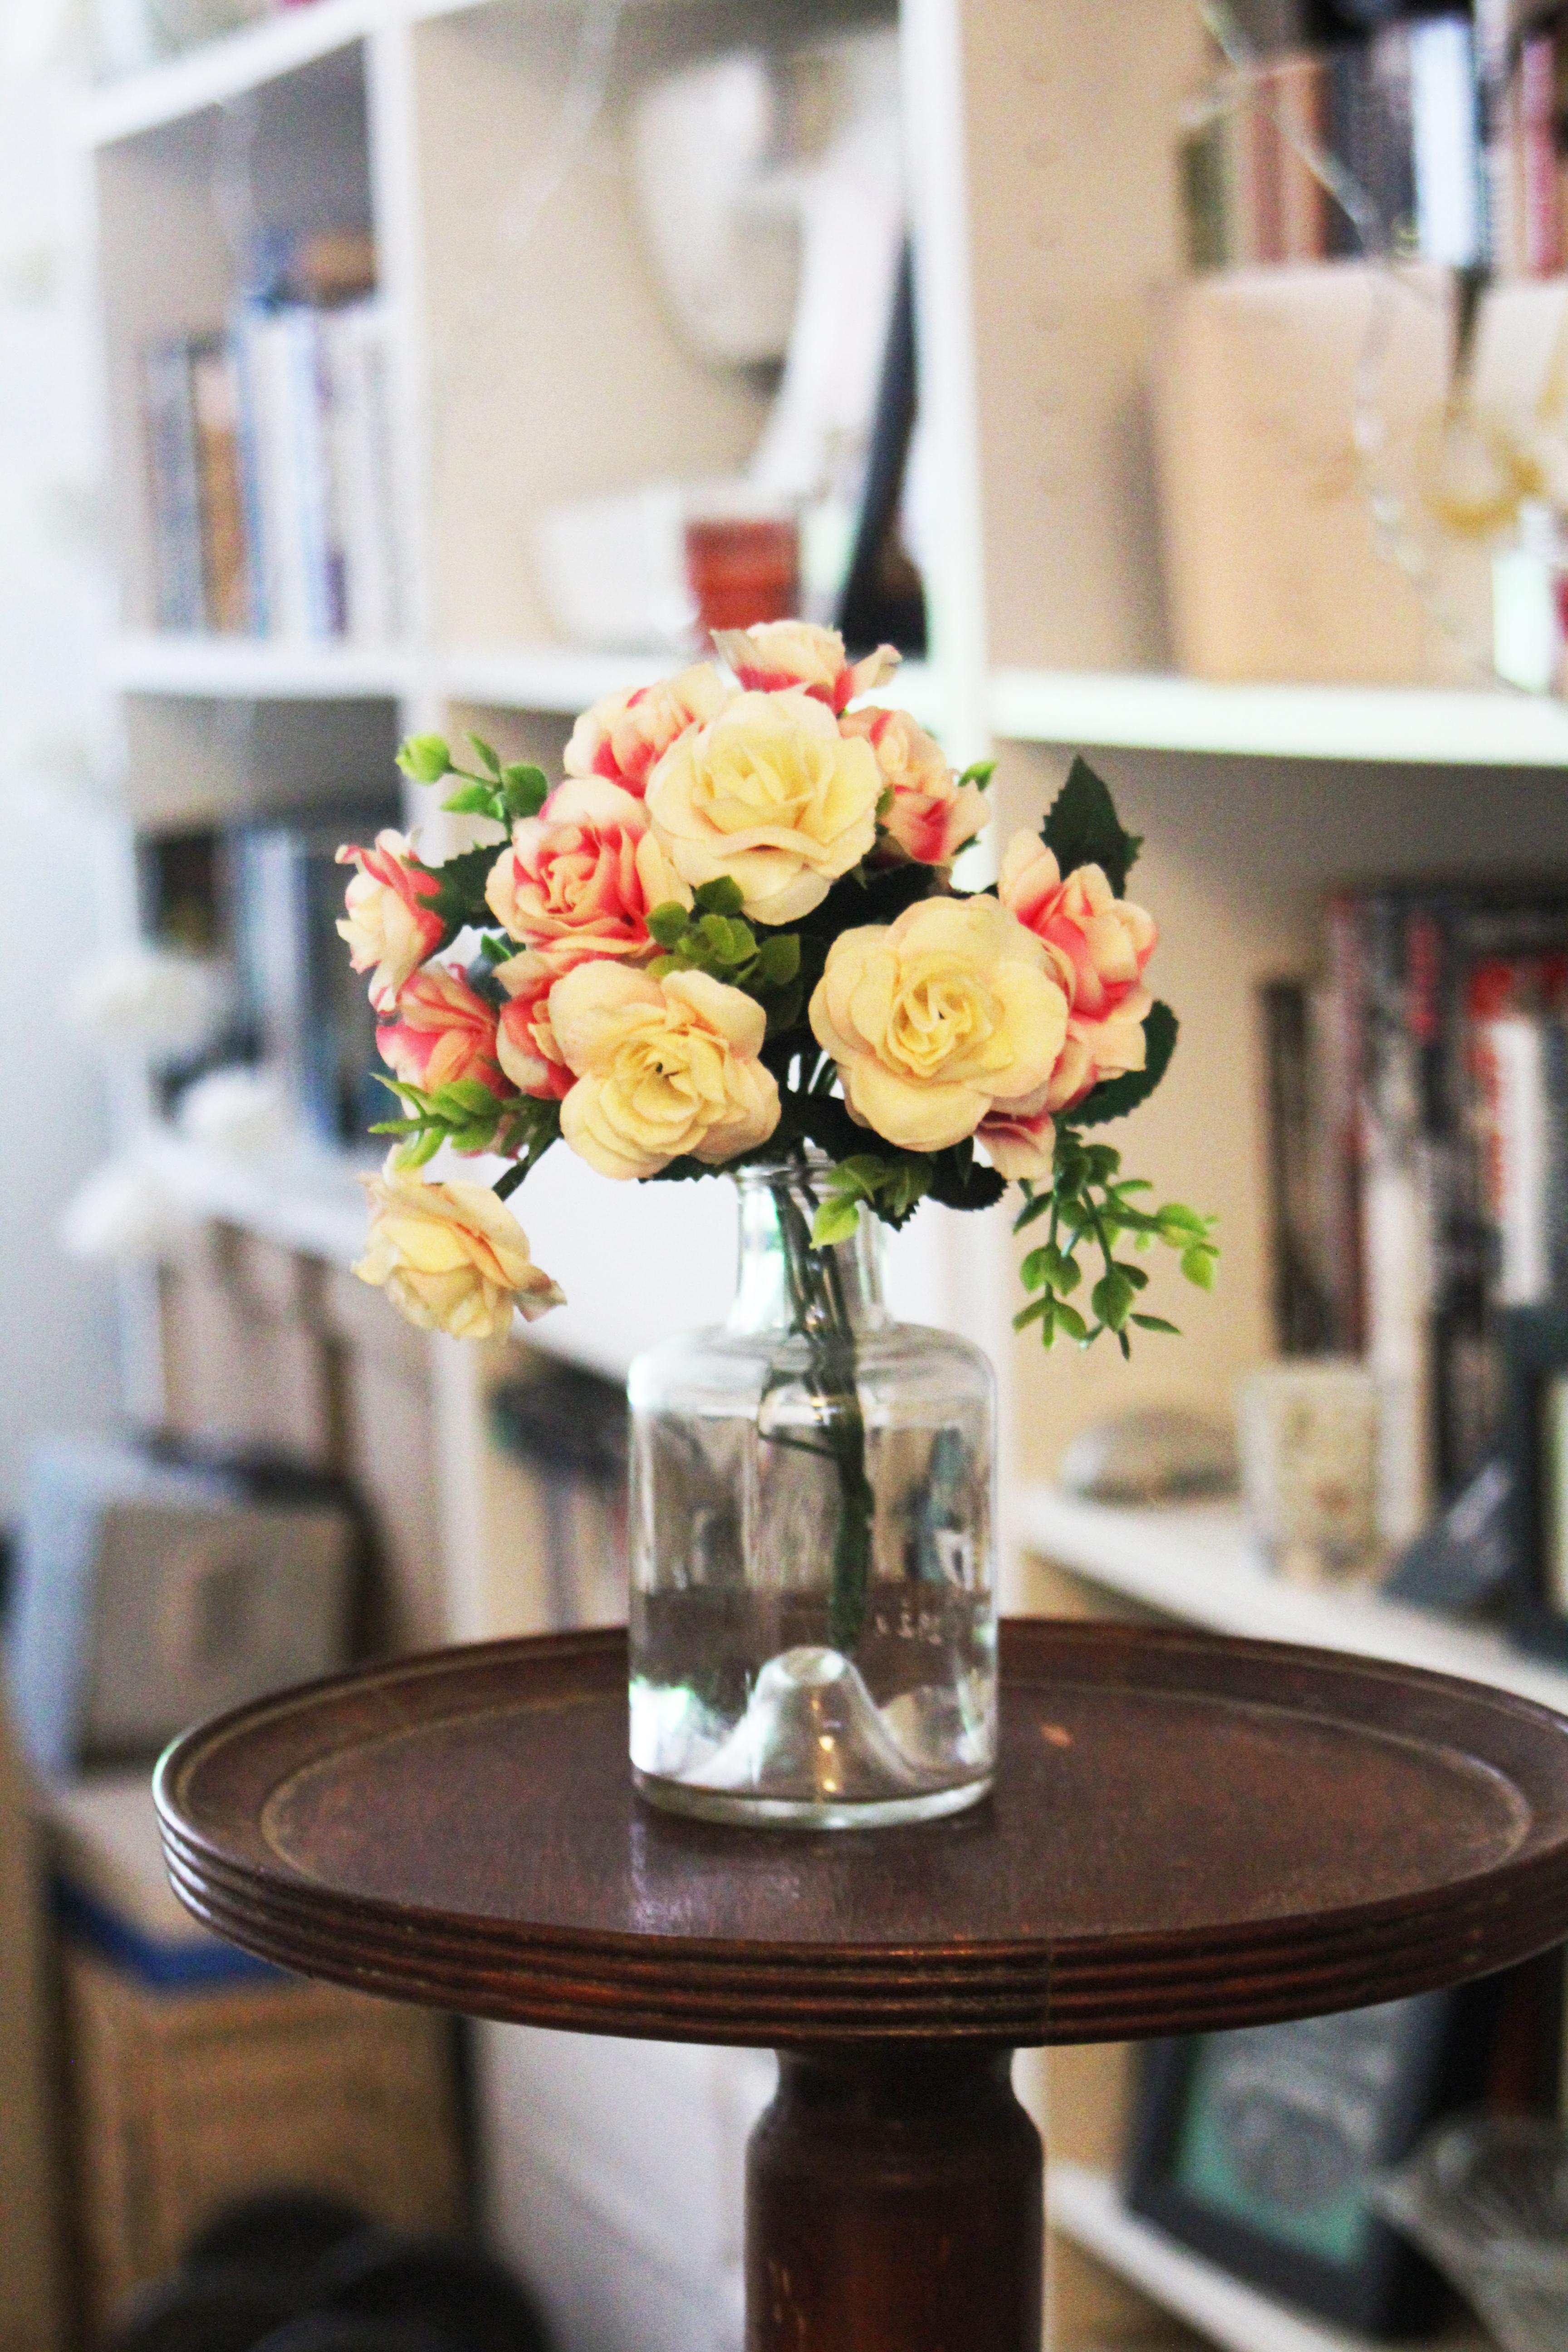 Arrange of Petal Flower in Clear Glass Vase at Table